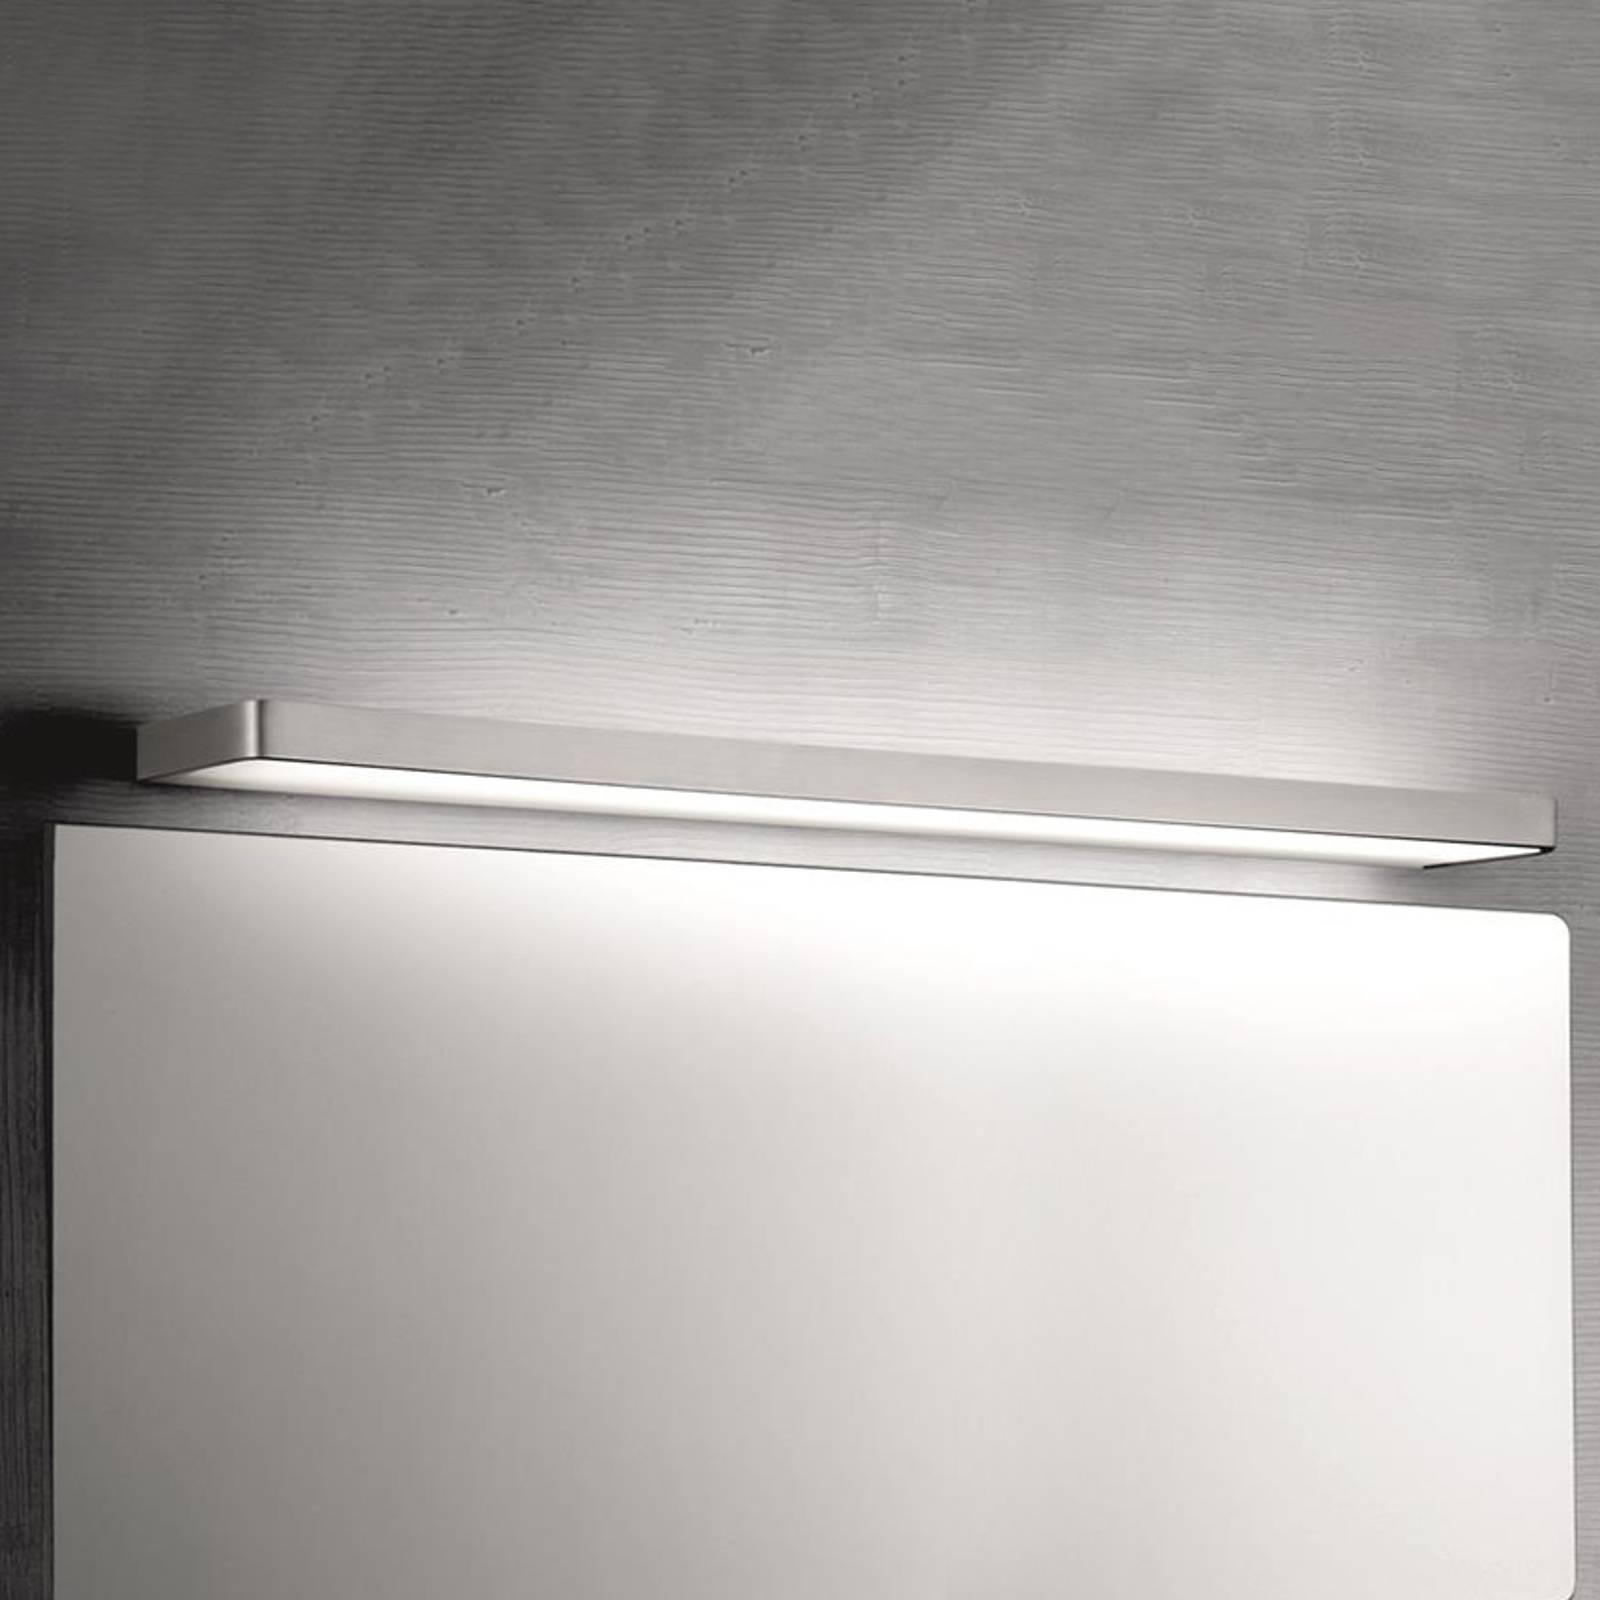 Arcos - LED-seinävalaisin, moderni design